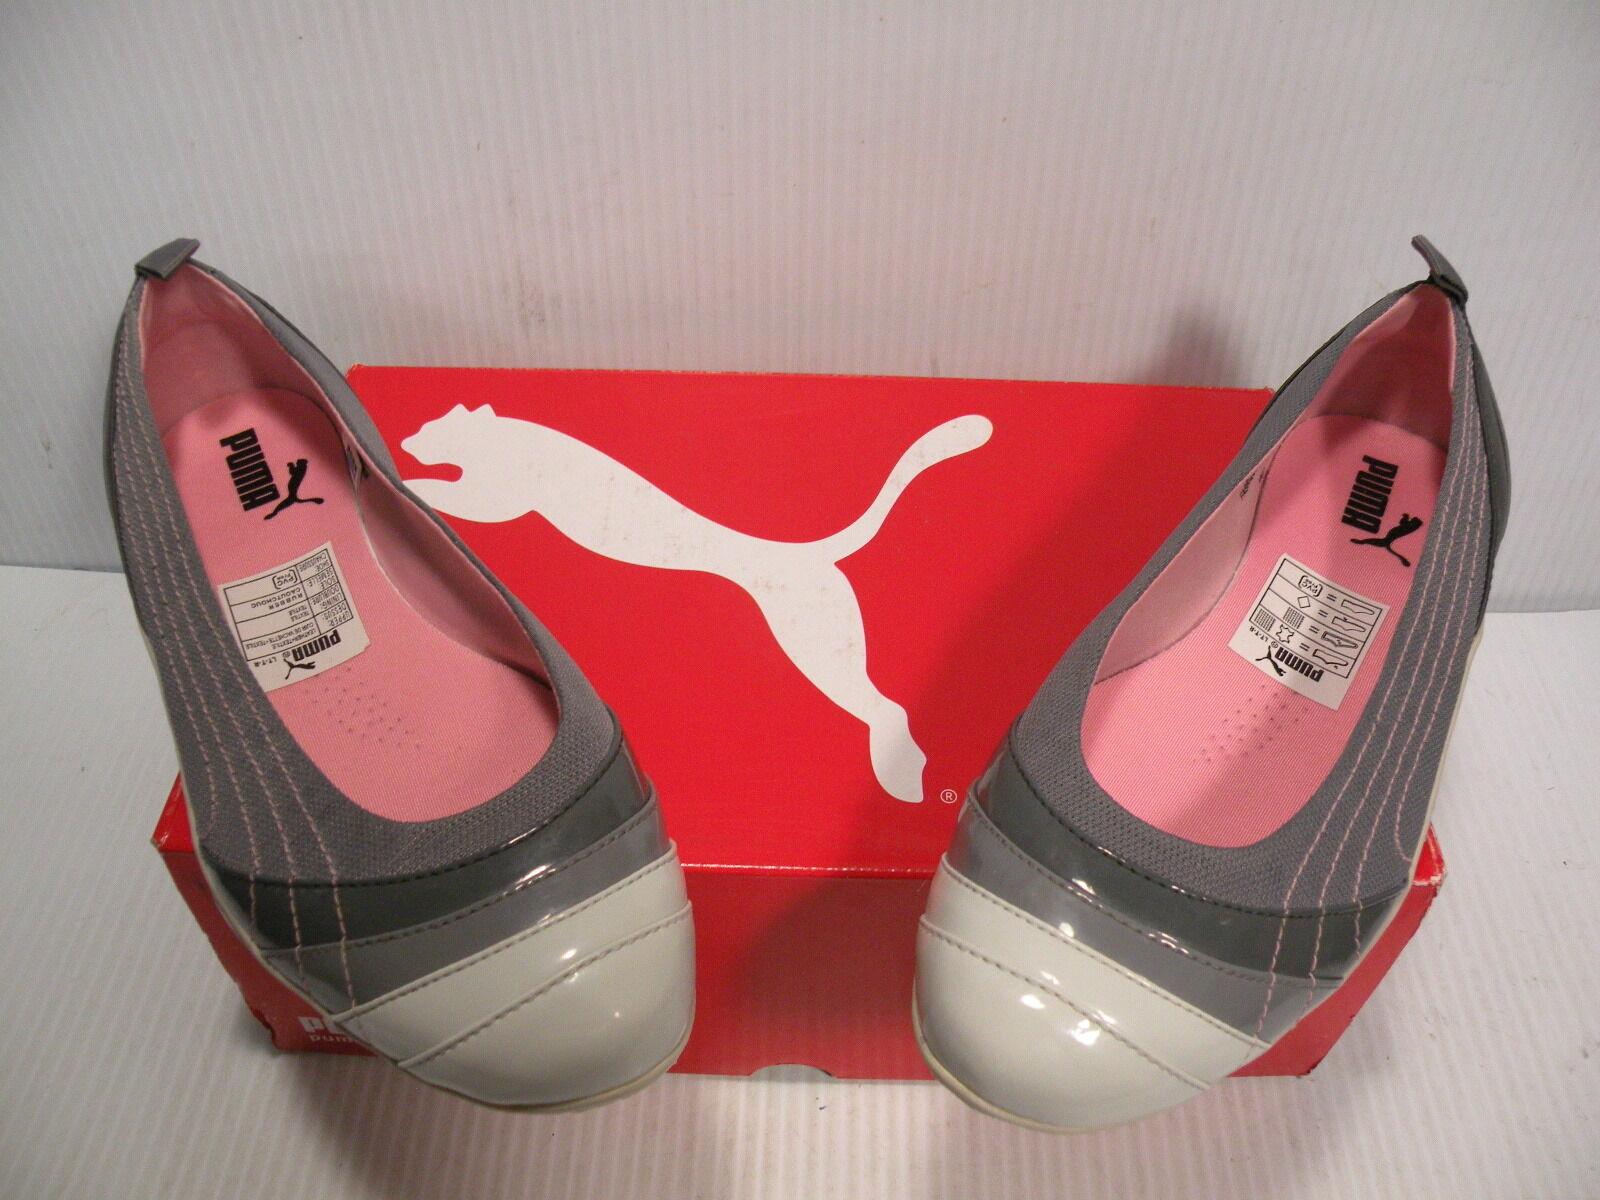 PUMA GINZA DORI LOW scarpe scarpe scarpe da ginnastica donna scarpe grigio bianca 344012-03 Dimensione 7 NEW dcd0ea